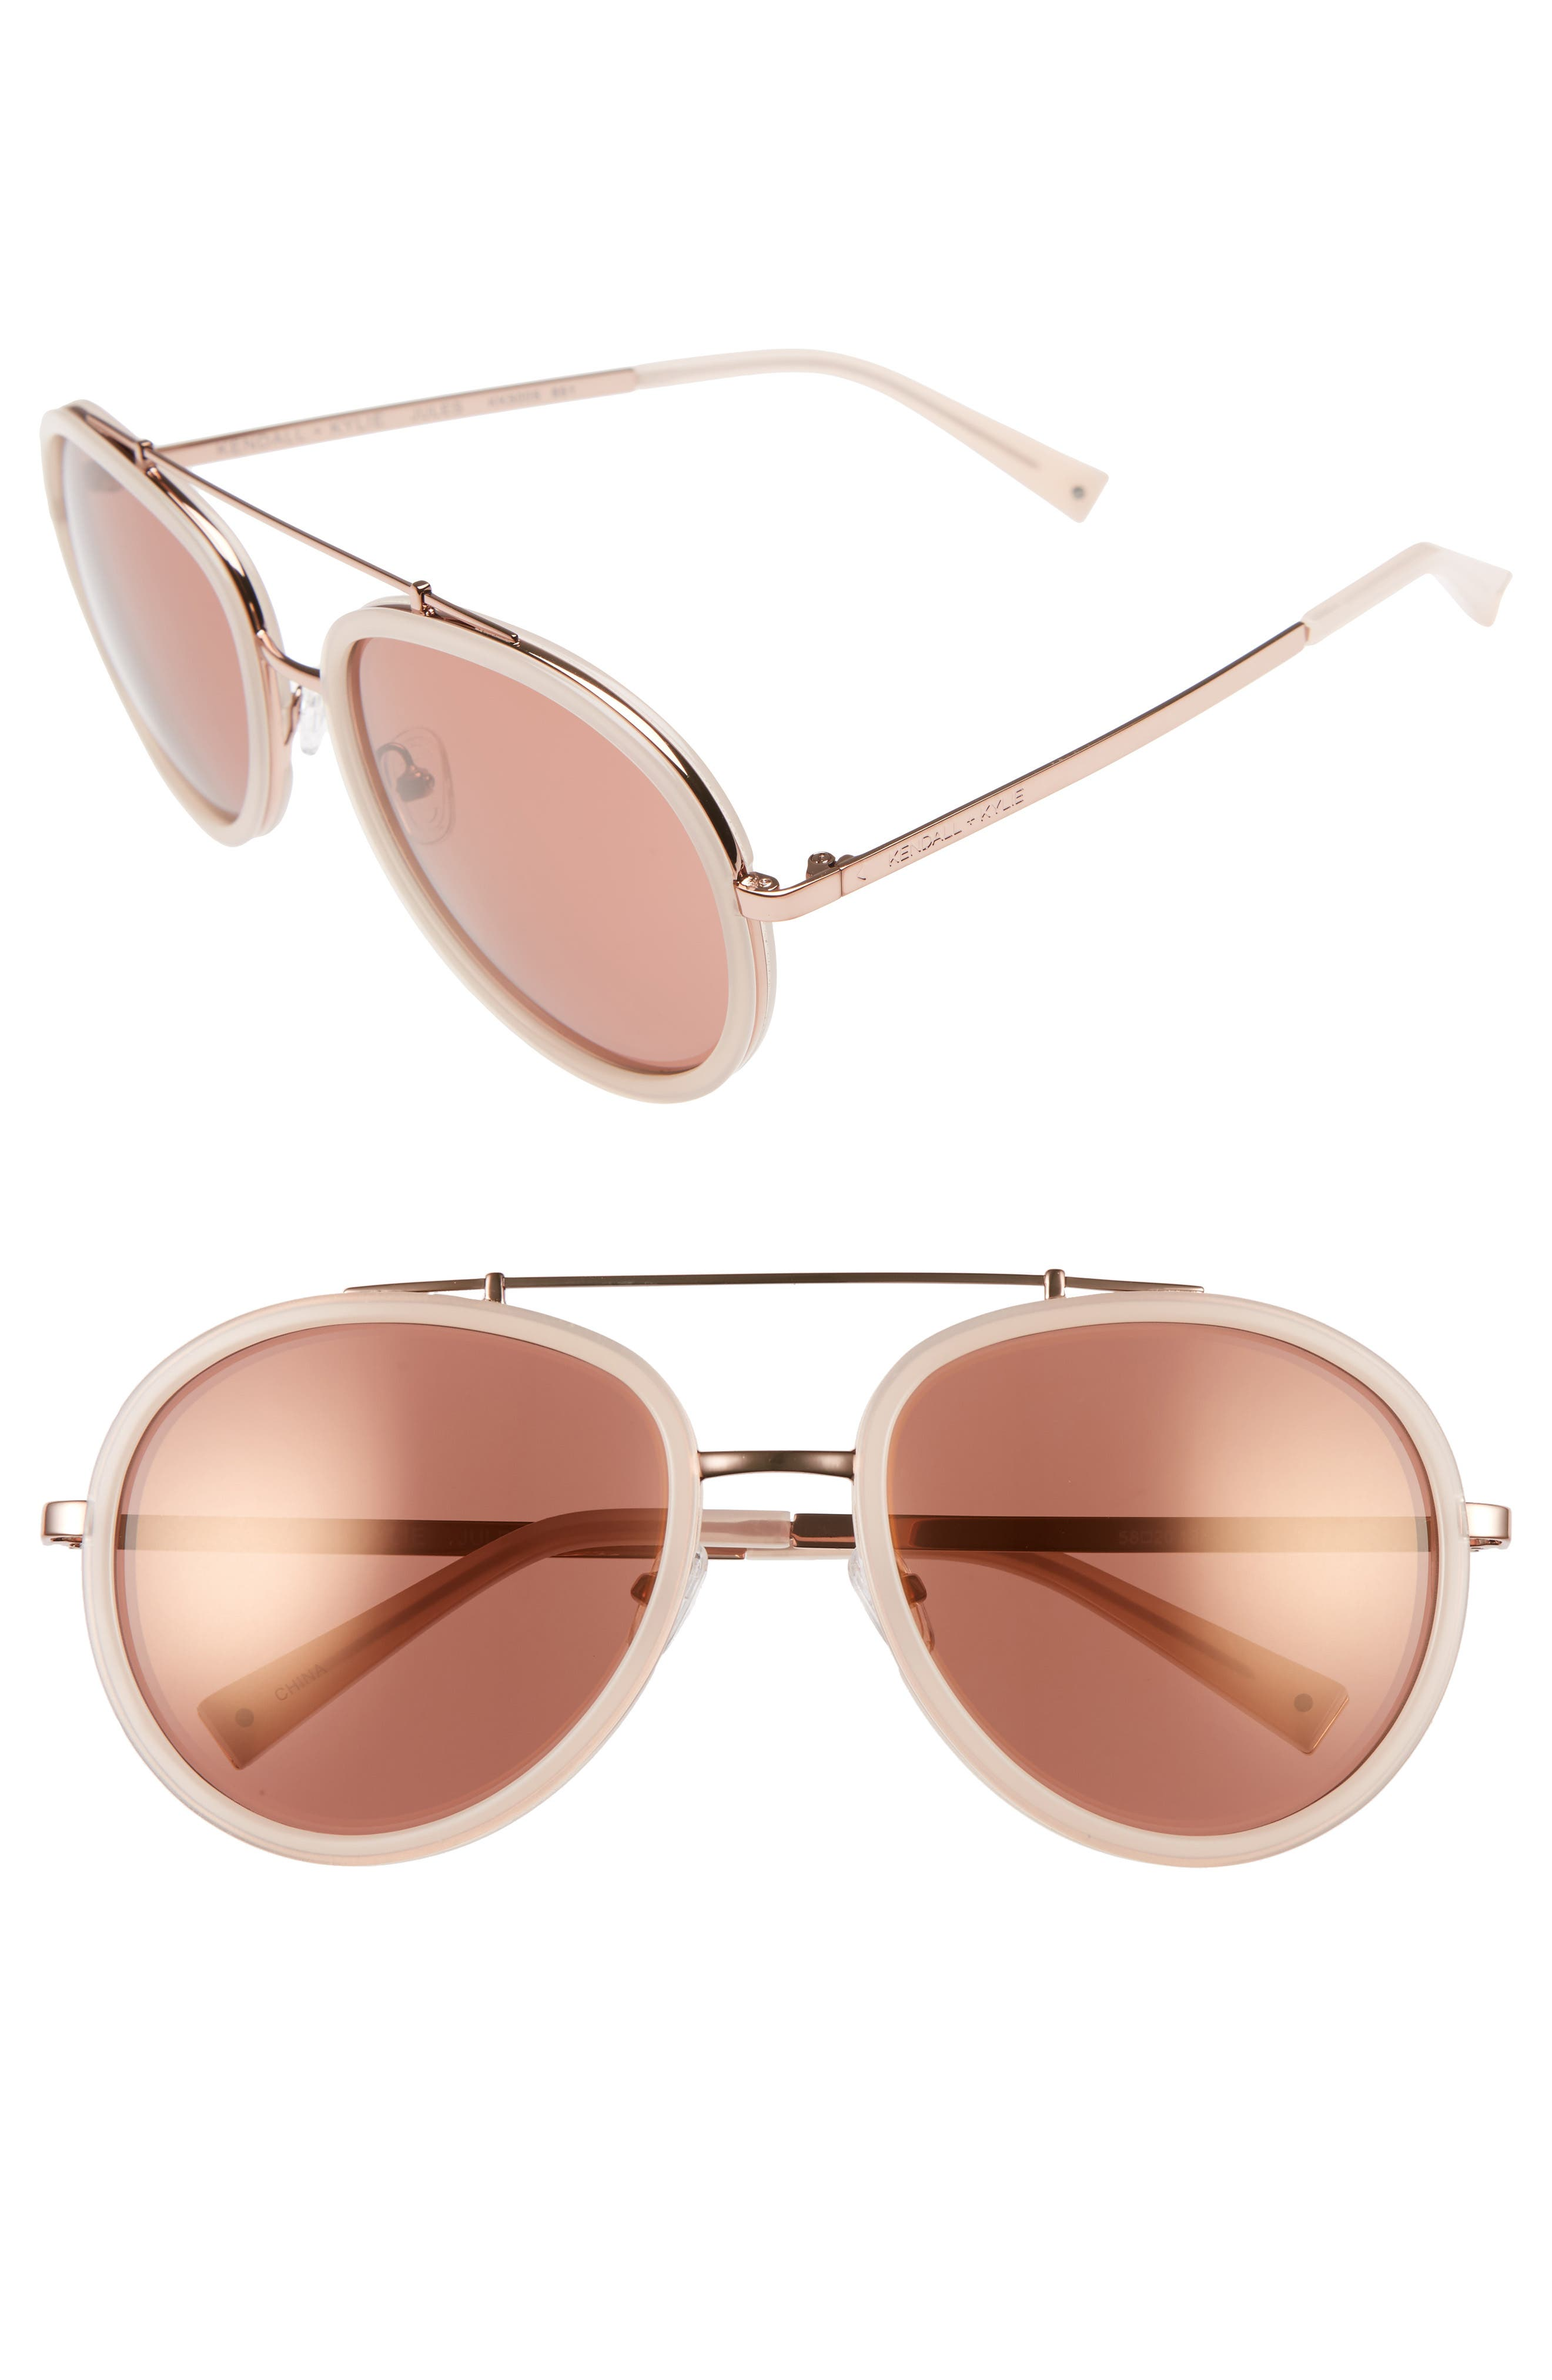 KENDALL + KYLIE Jules 58mm Aviator Sunglasses